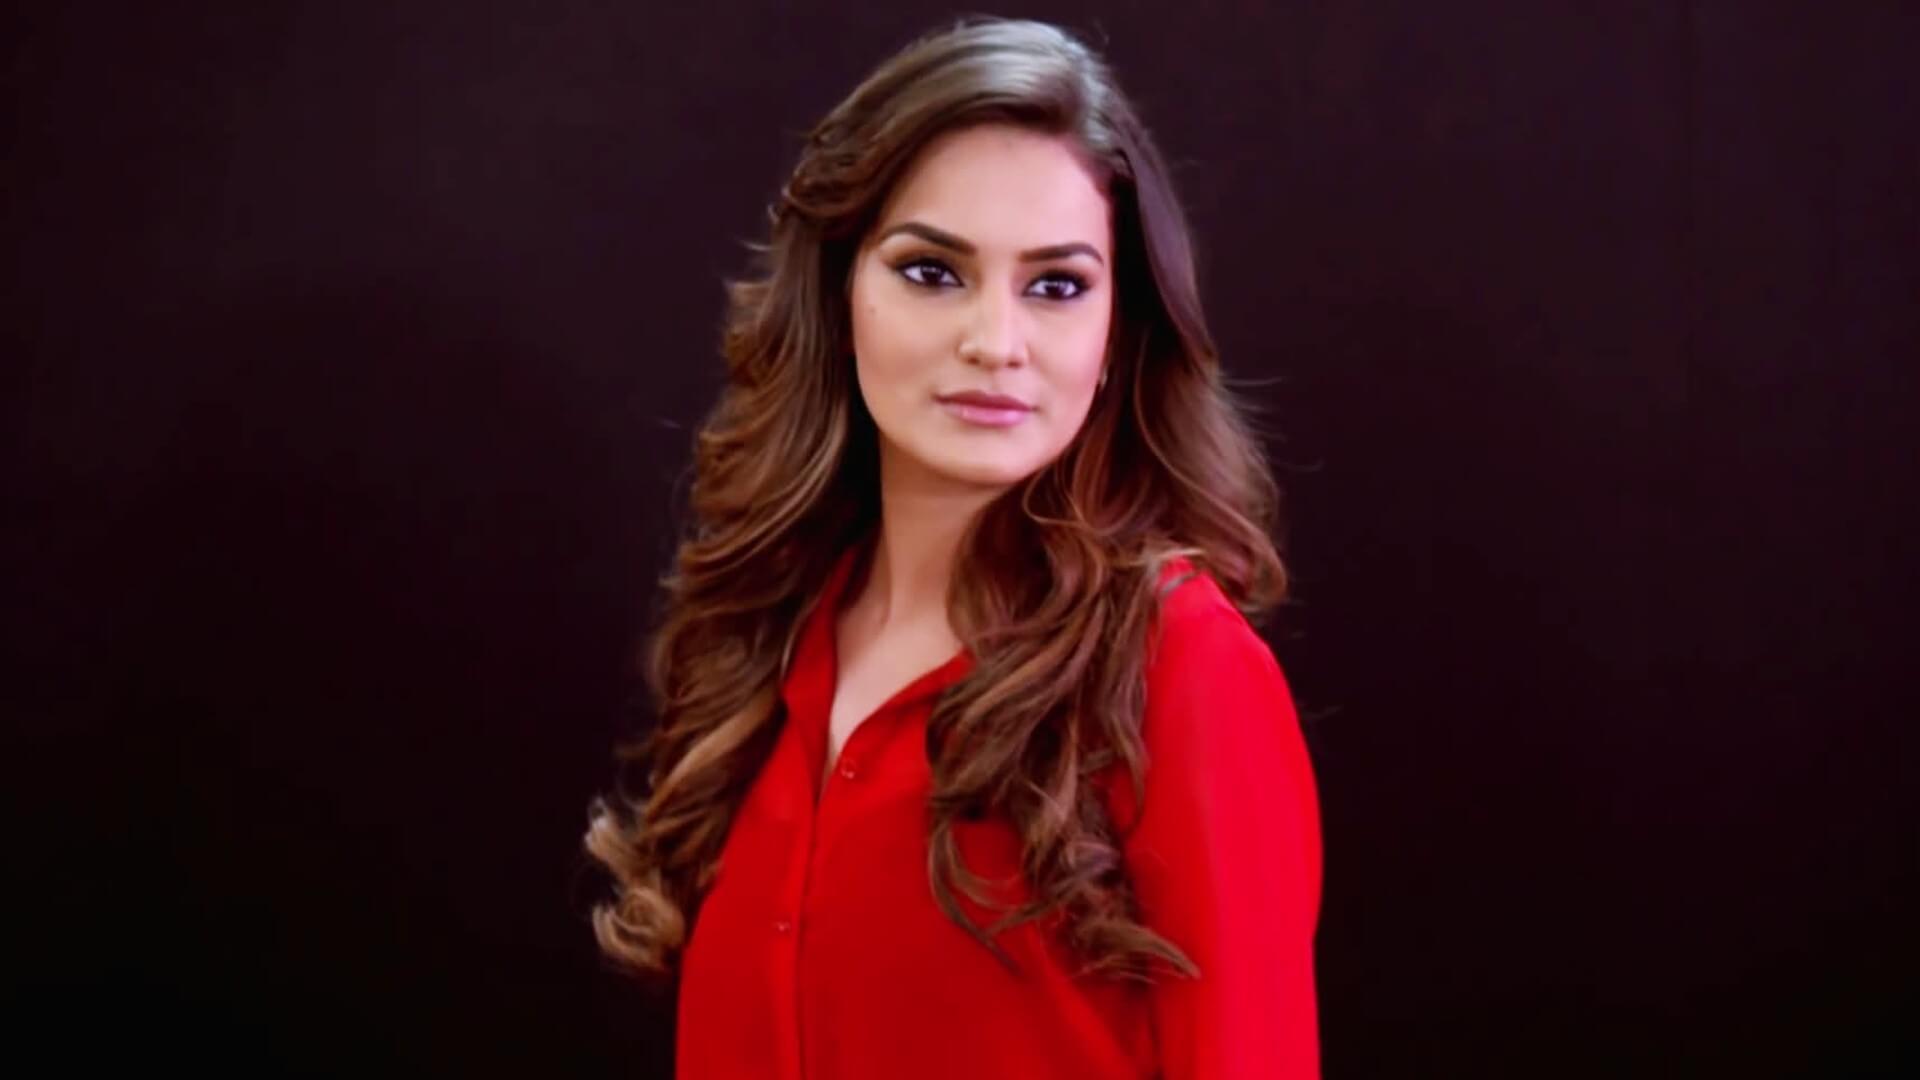 Priyanka Purohit Wiki, Age, Height, Weight, Family, Caste, Boyfriend, Biography & Images